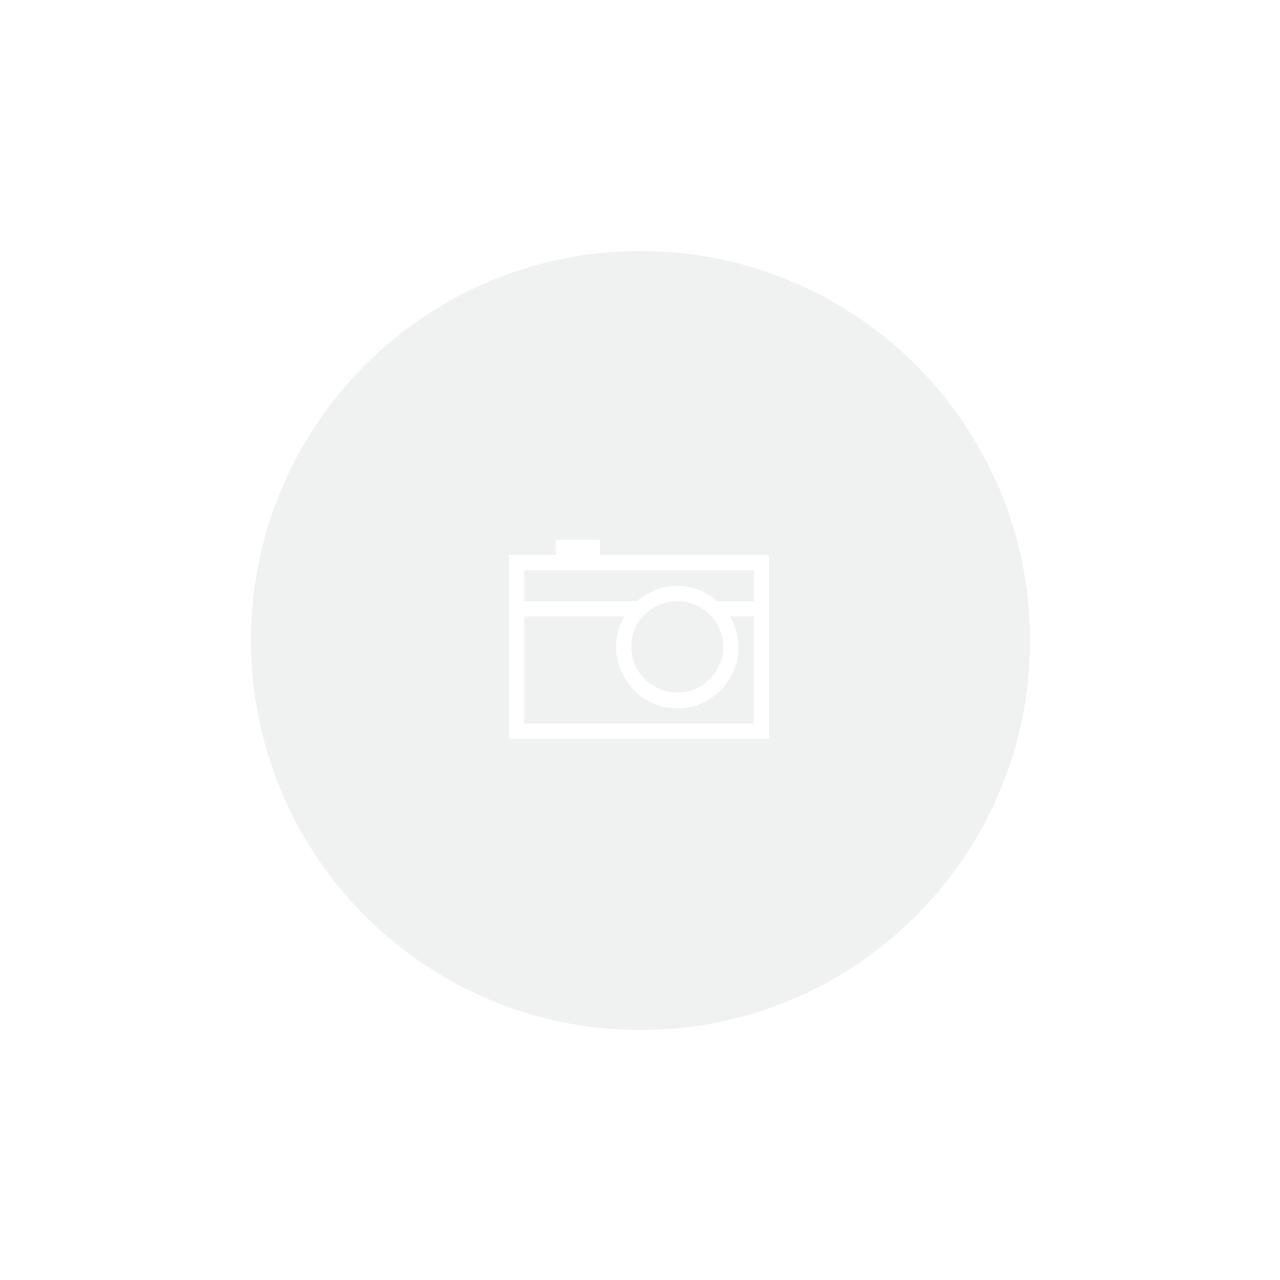 Cozi-Vapore Inox 24Cm 5,60 Litros Profissional Tramontina